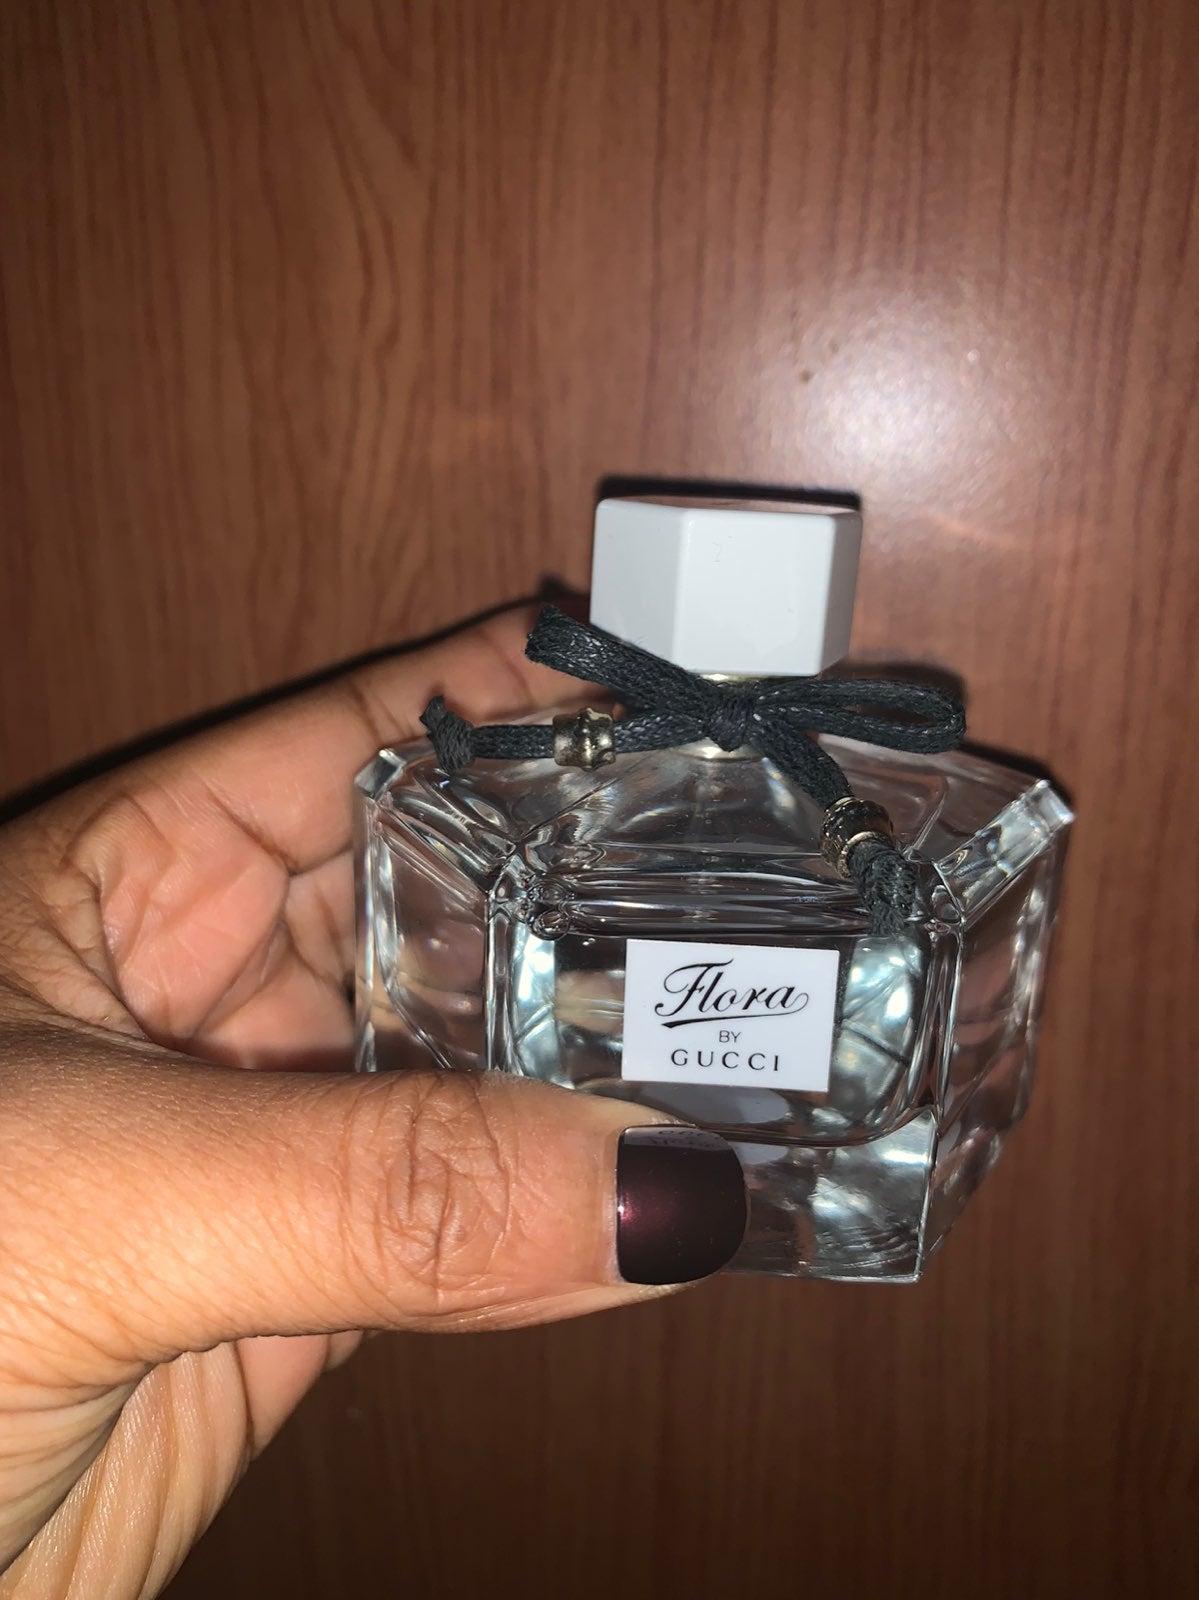 Gucci perfume fragrances for women